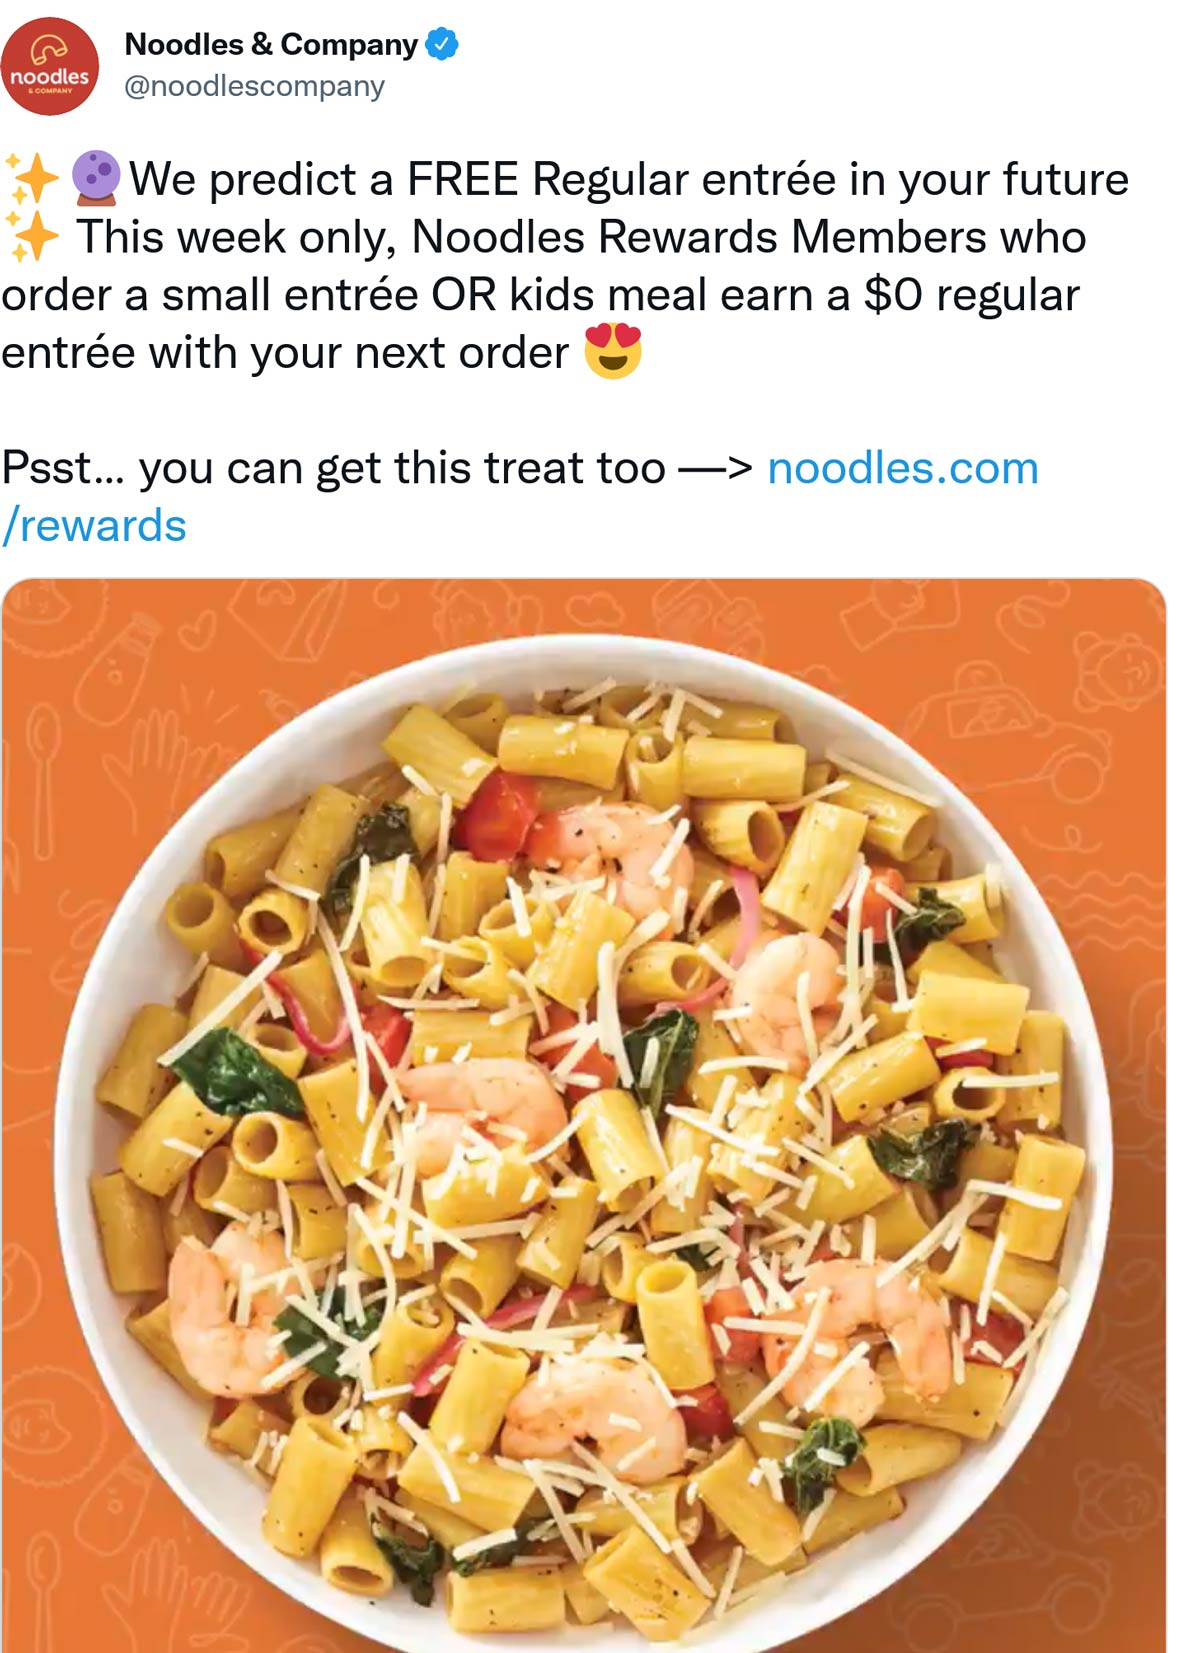 Noodles & Company restaurants Coupon  Second followup entree free at Noodles & Company #noodlescompany